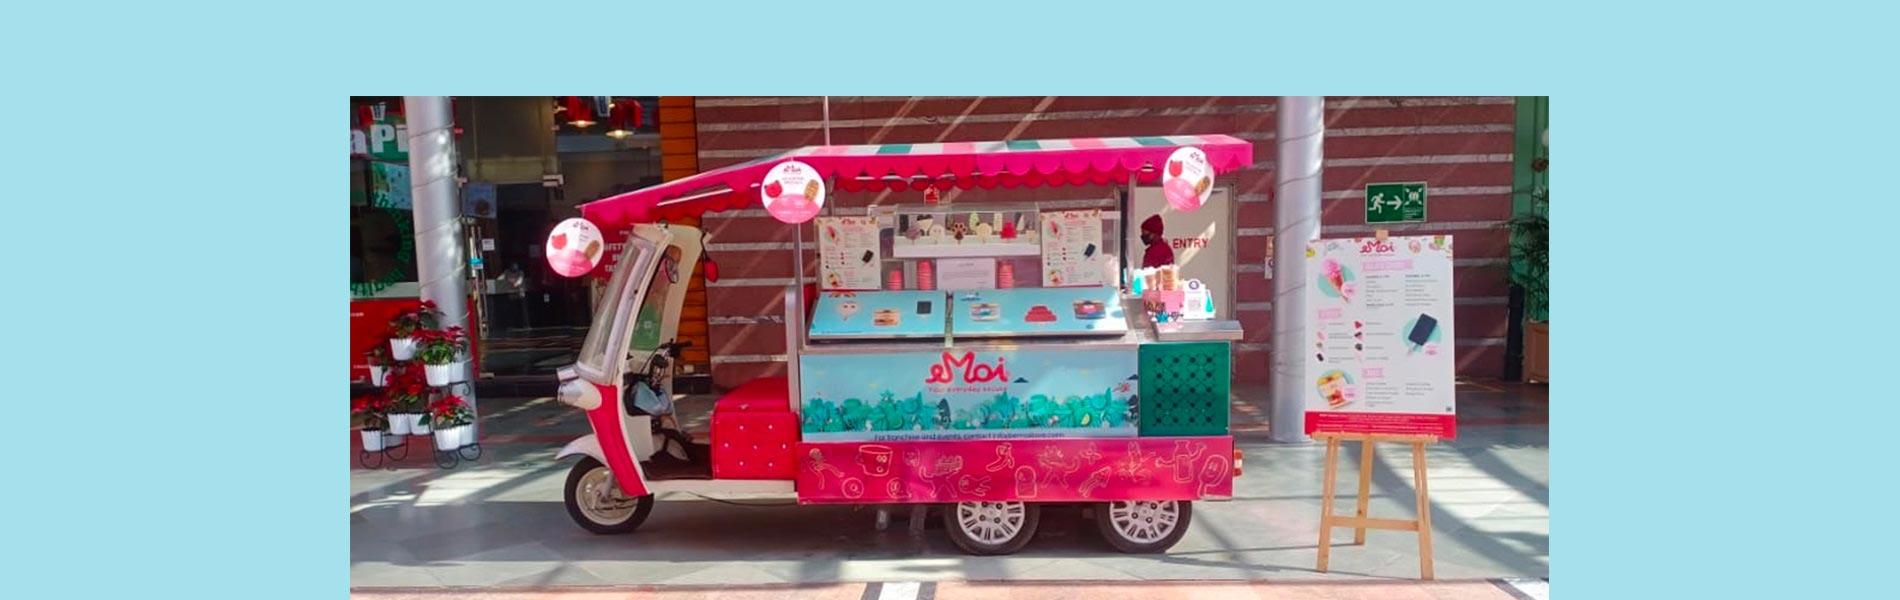 Emoi Artisanal Ice cream & Gelato